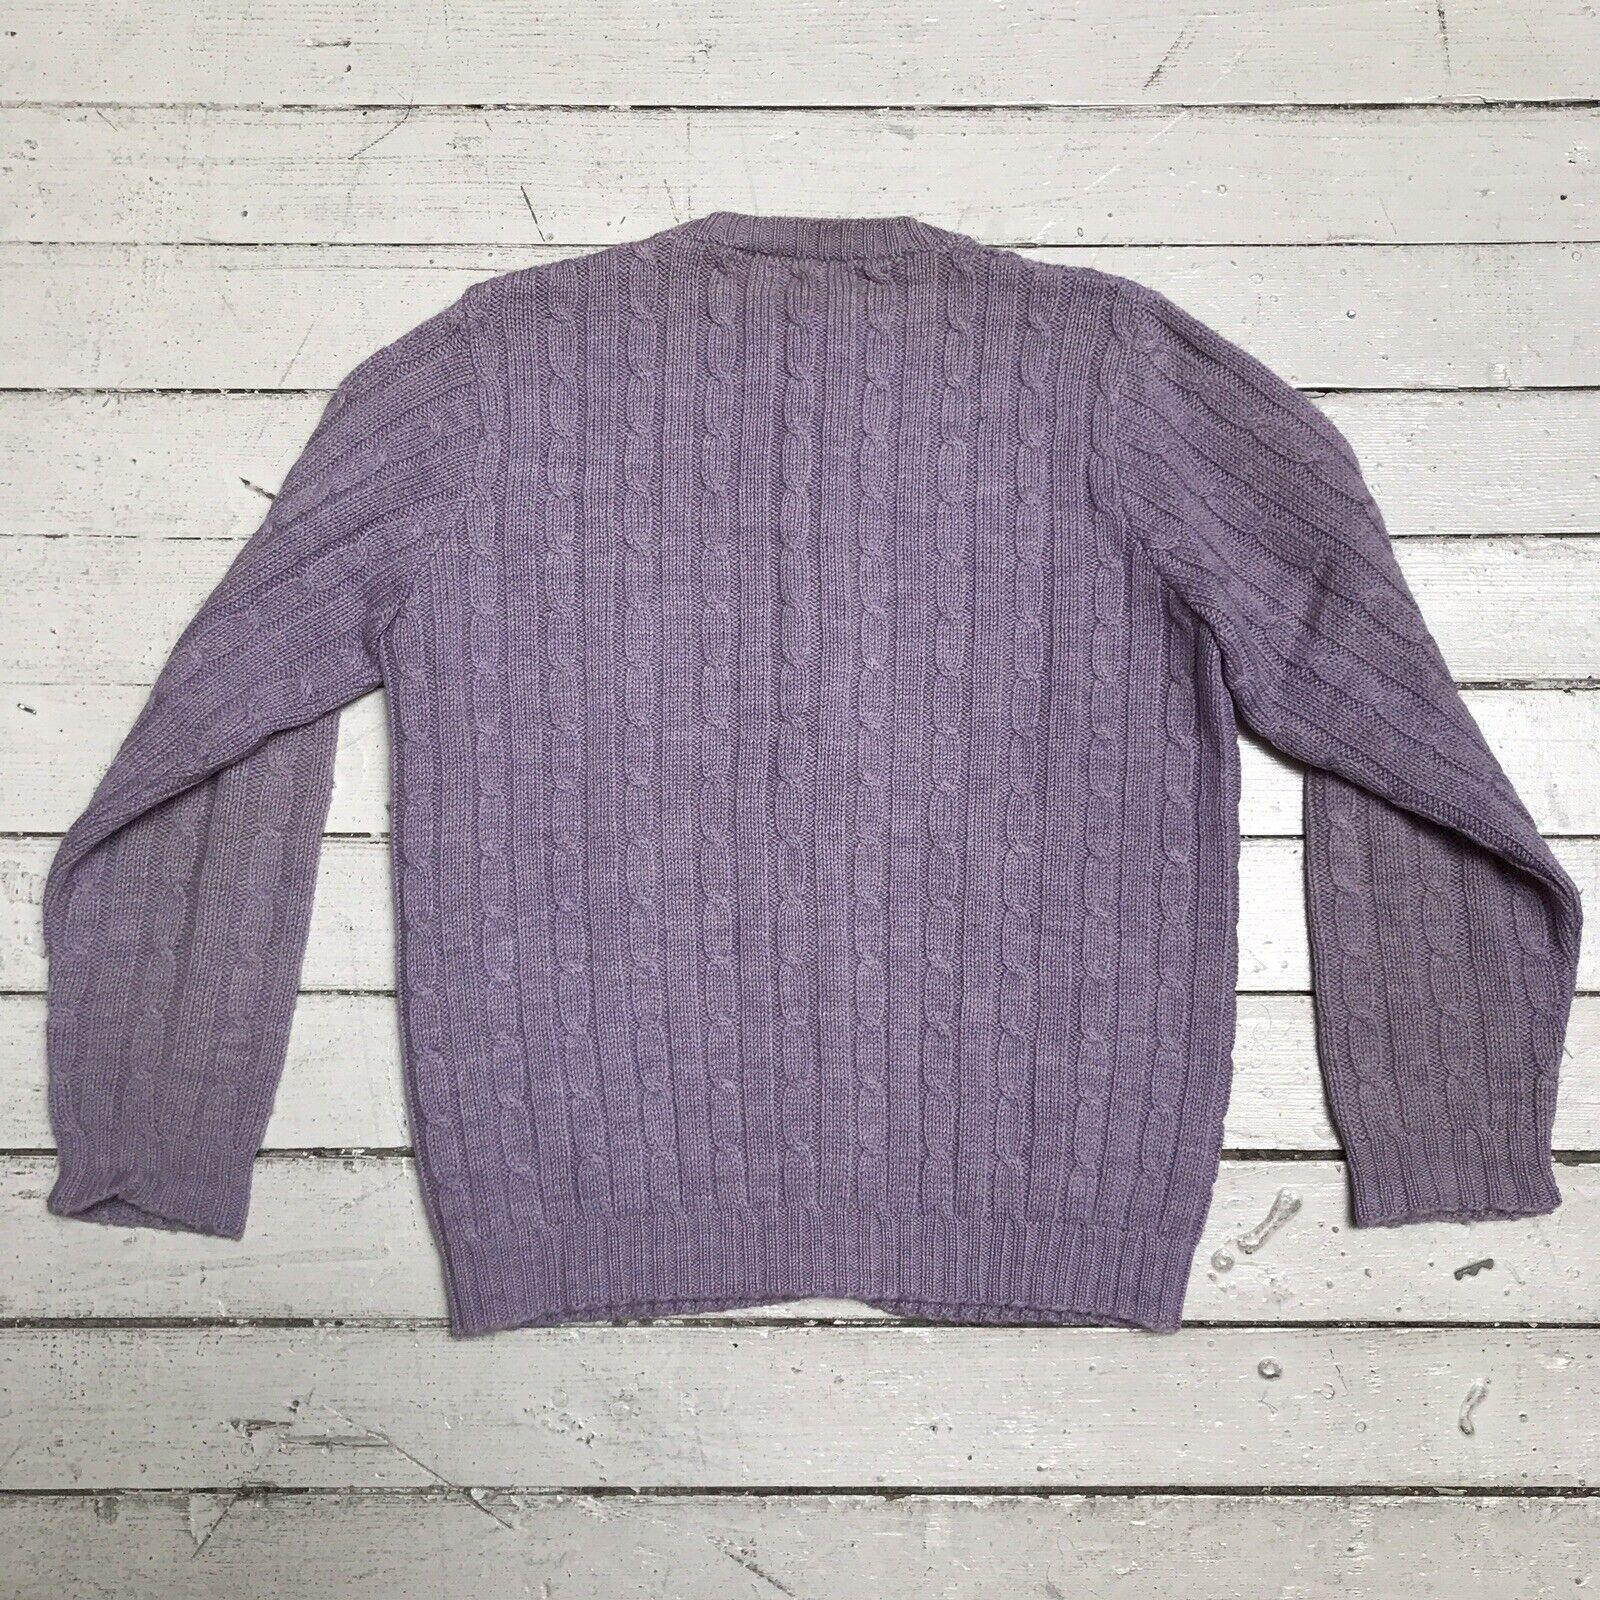 VTG EDWARD WARREN Light Purple Lilac Cable Knit S… - image 6